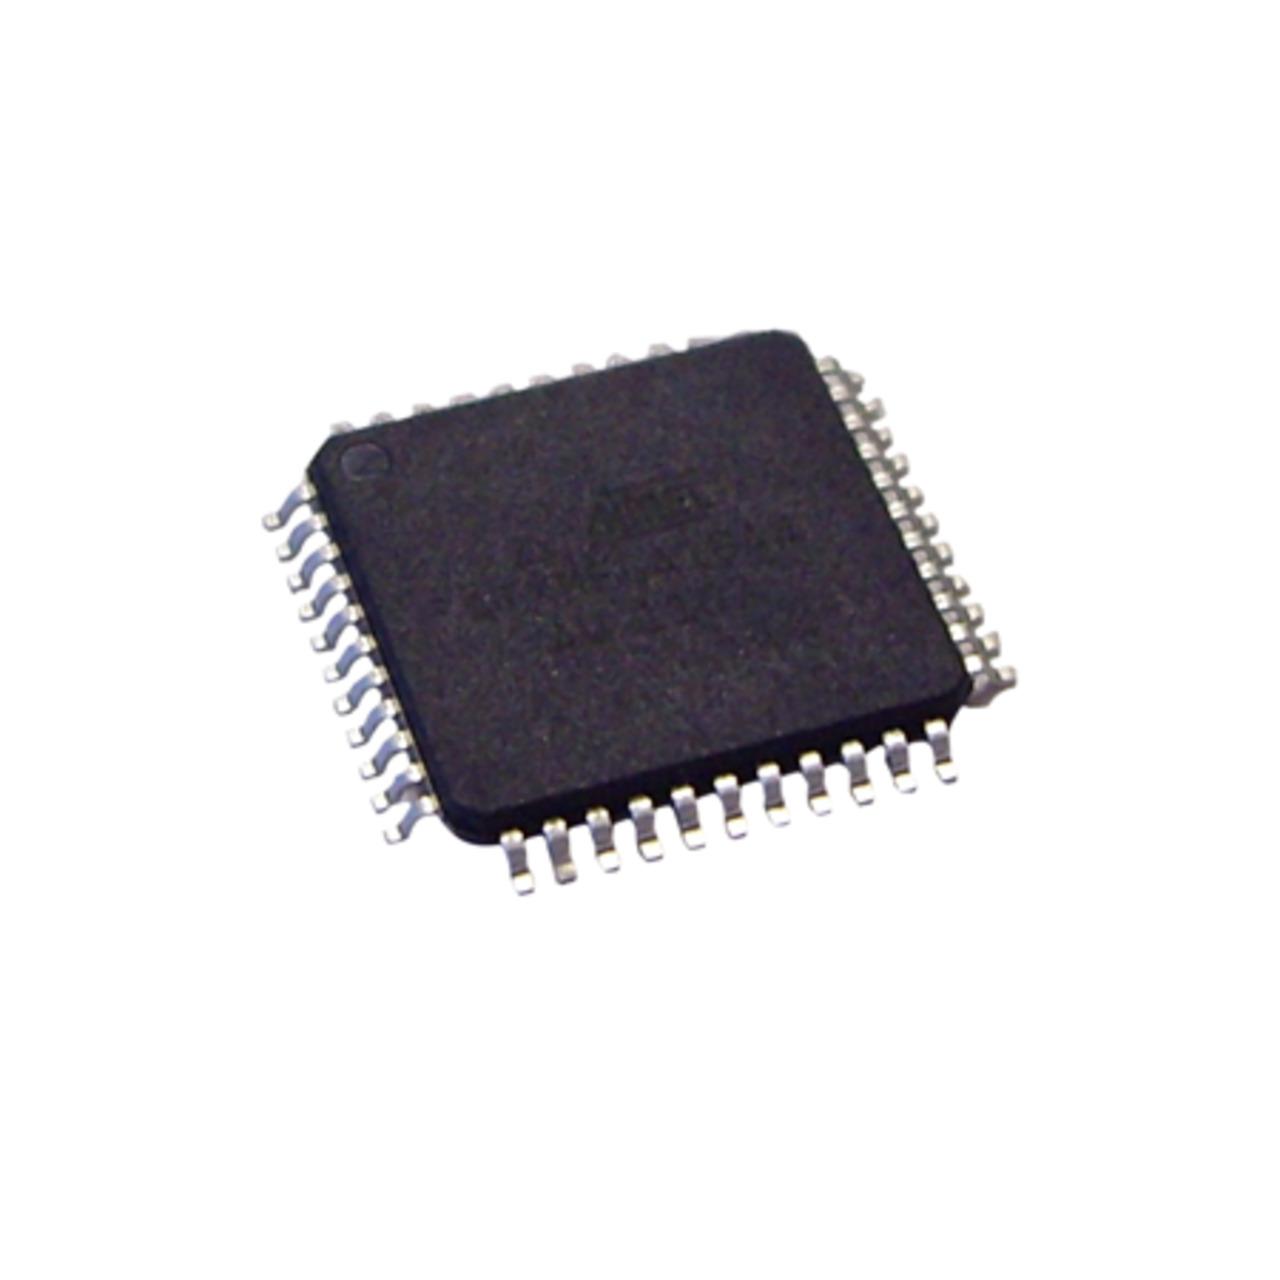 Image of Atmel Mikrocontroller AT32UC3L032-AUT TQFP48